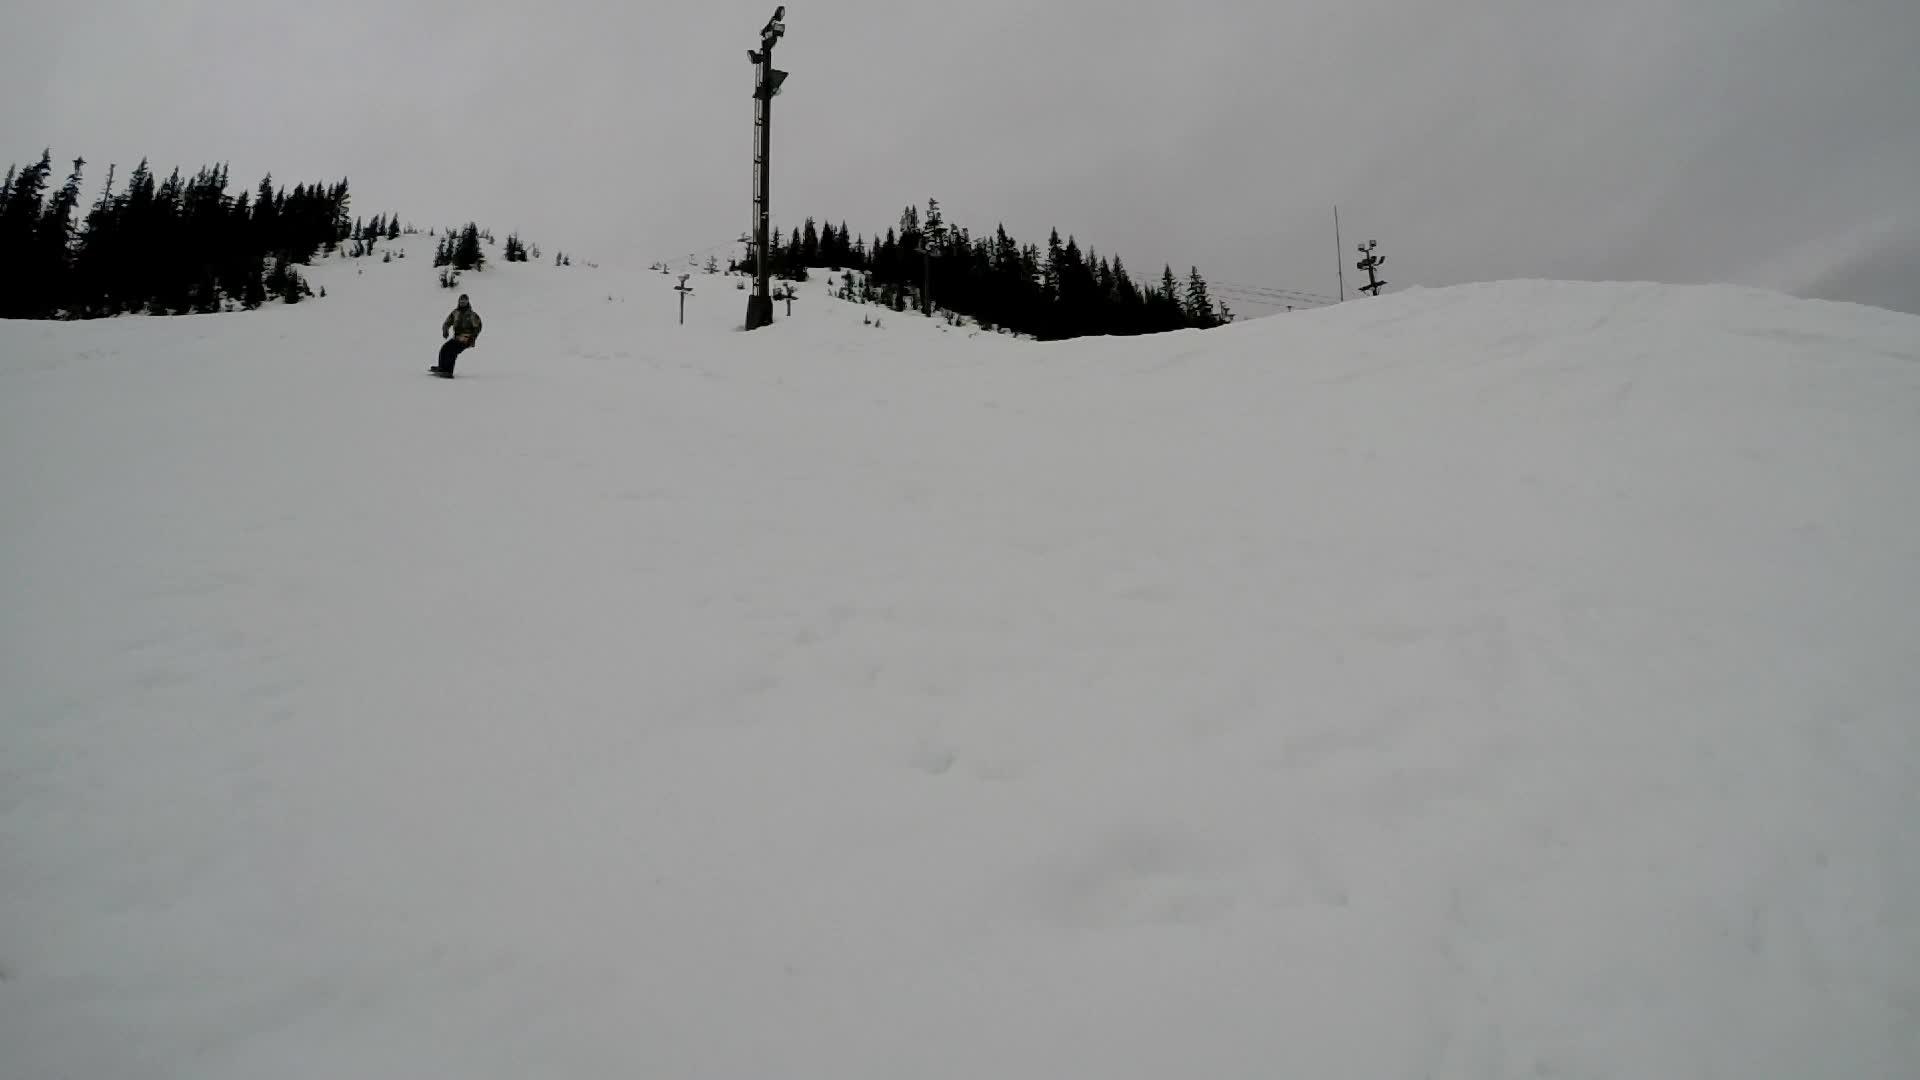 snowboard, snowboarding, sports, trueshreddit, Untitlednostabilization GIFs